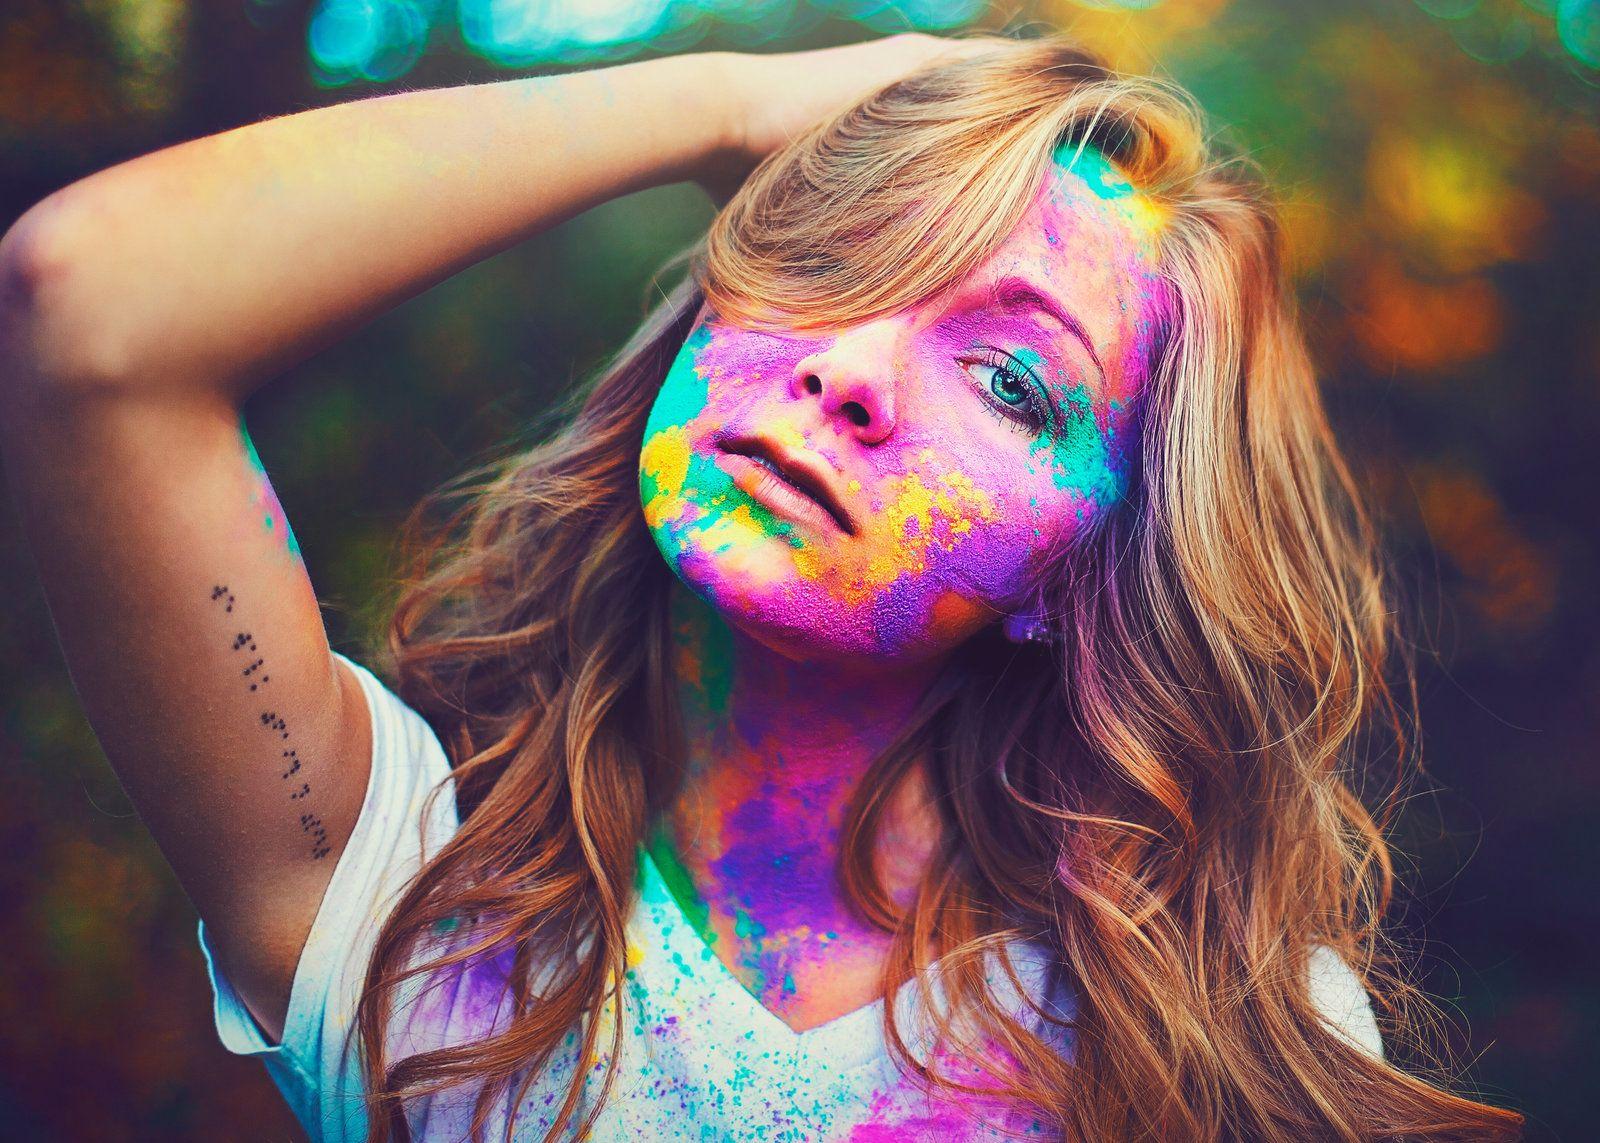 Emalee unqiue senior photos with color powder bismarck